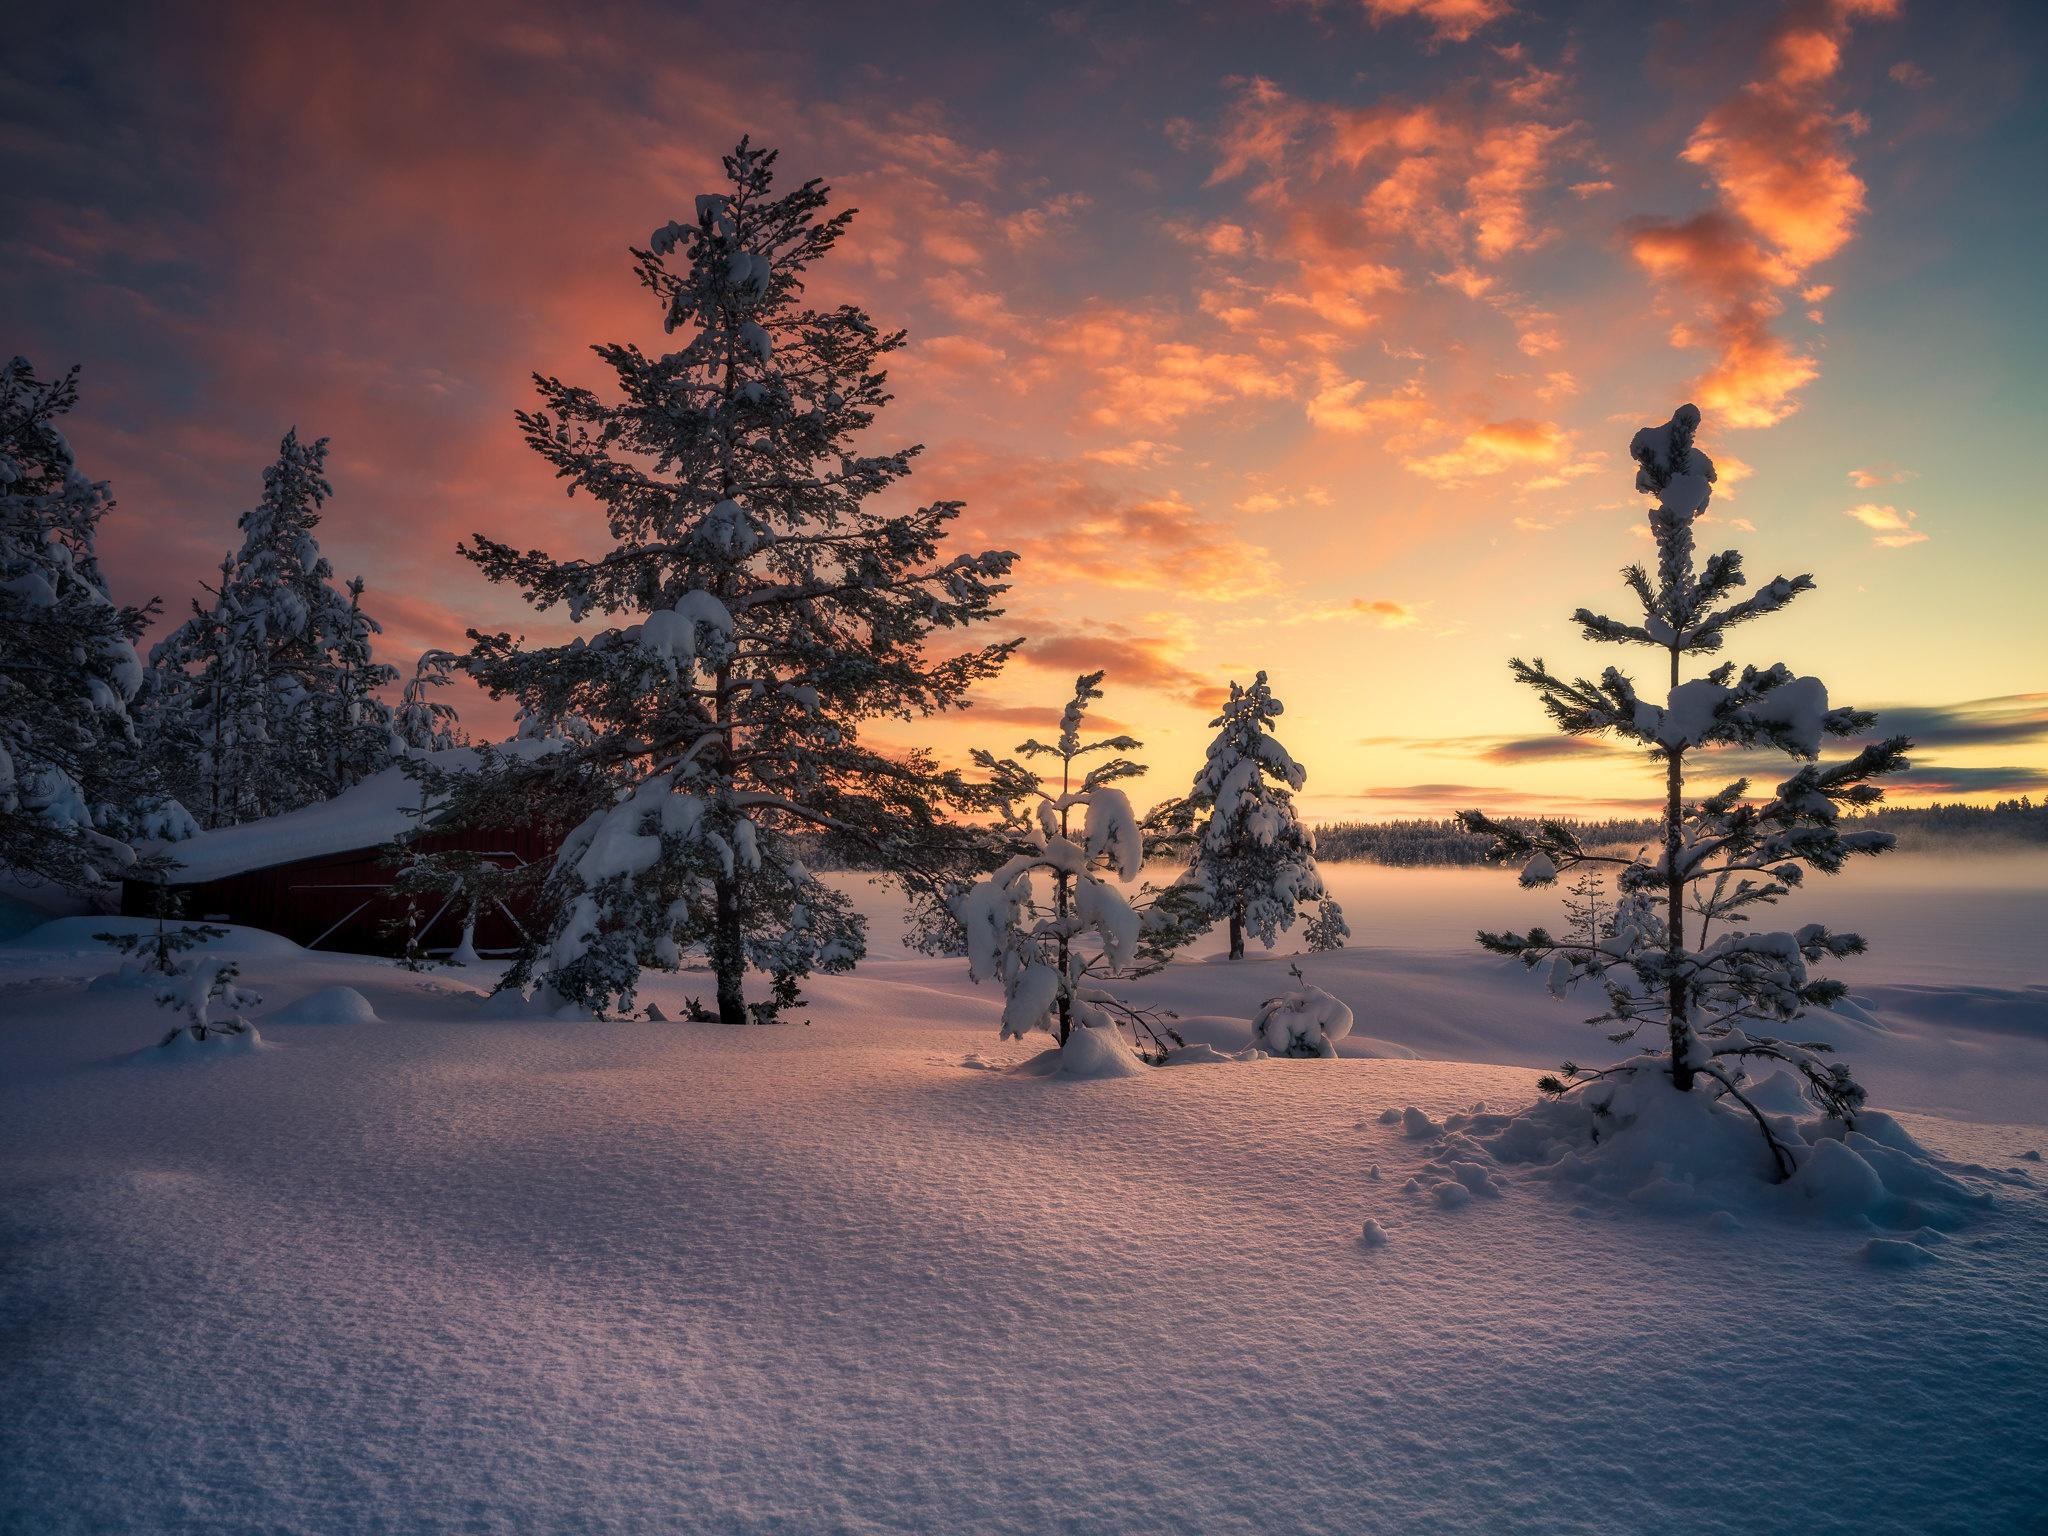 Wallpaper Snow Cold Winter Sky Nature Trees Sunlight